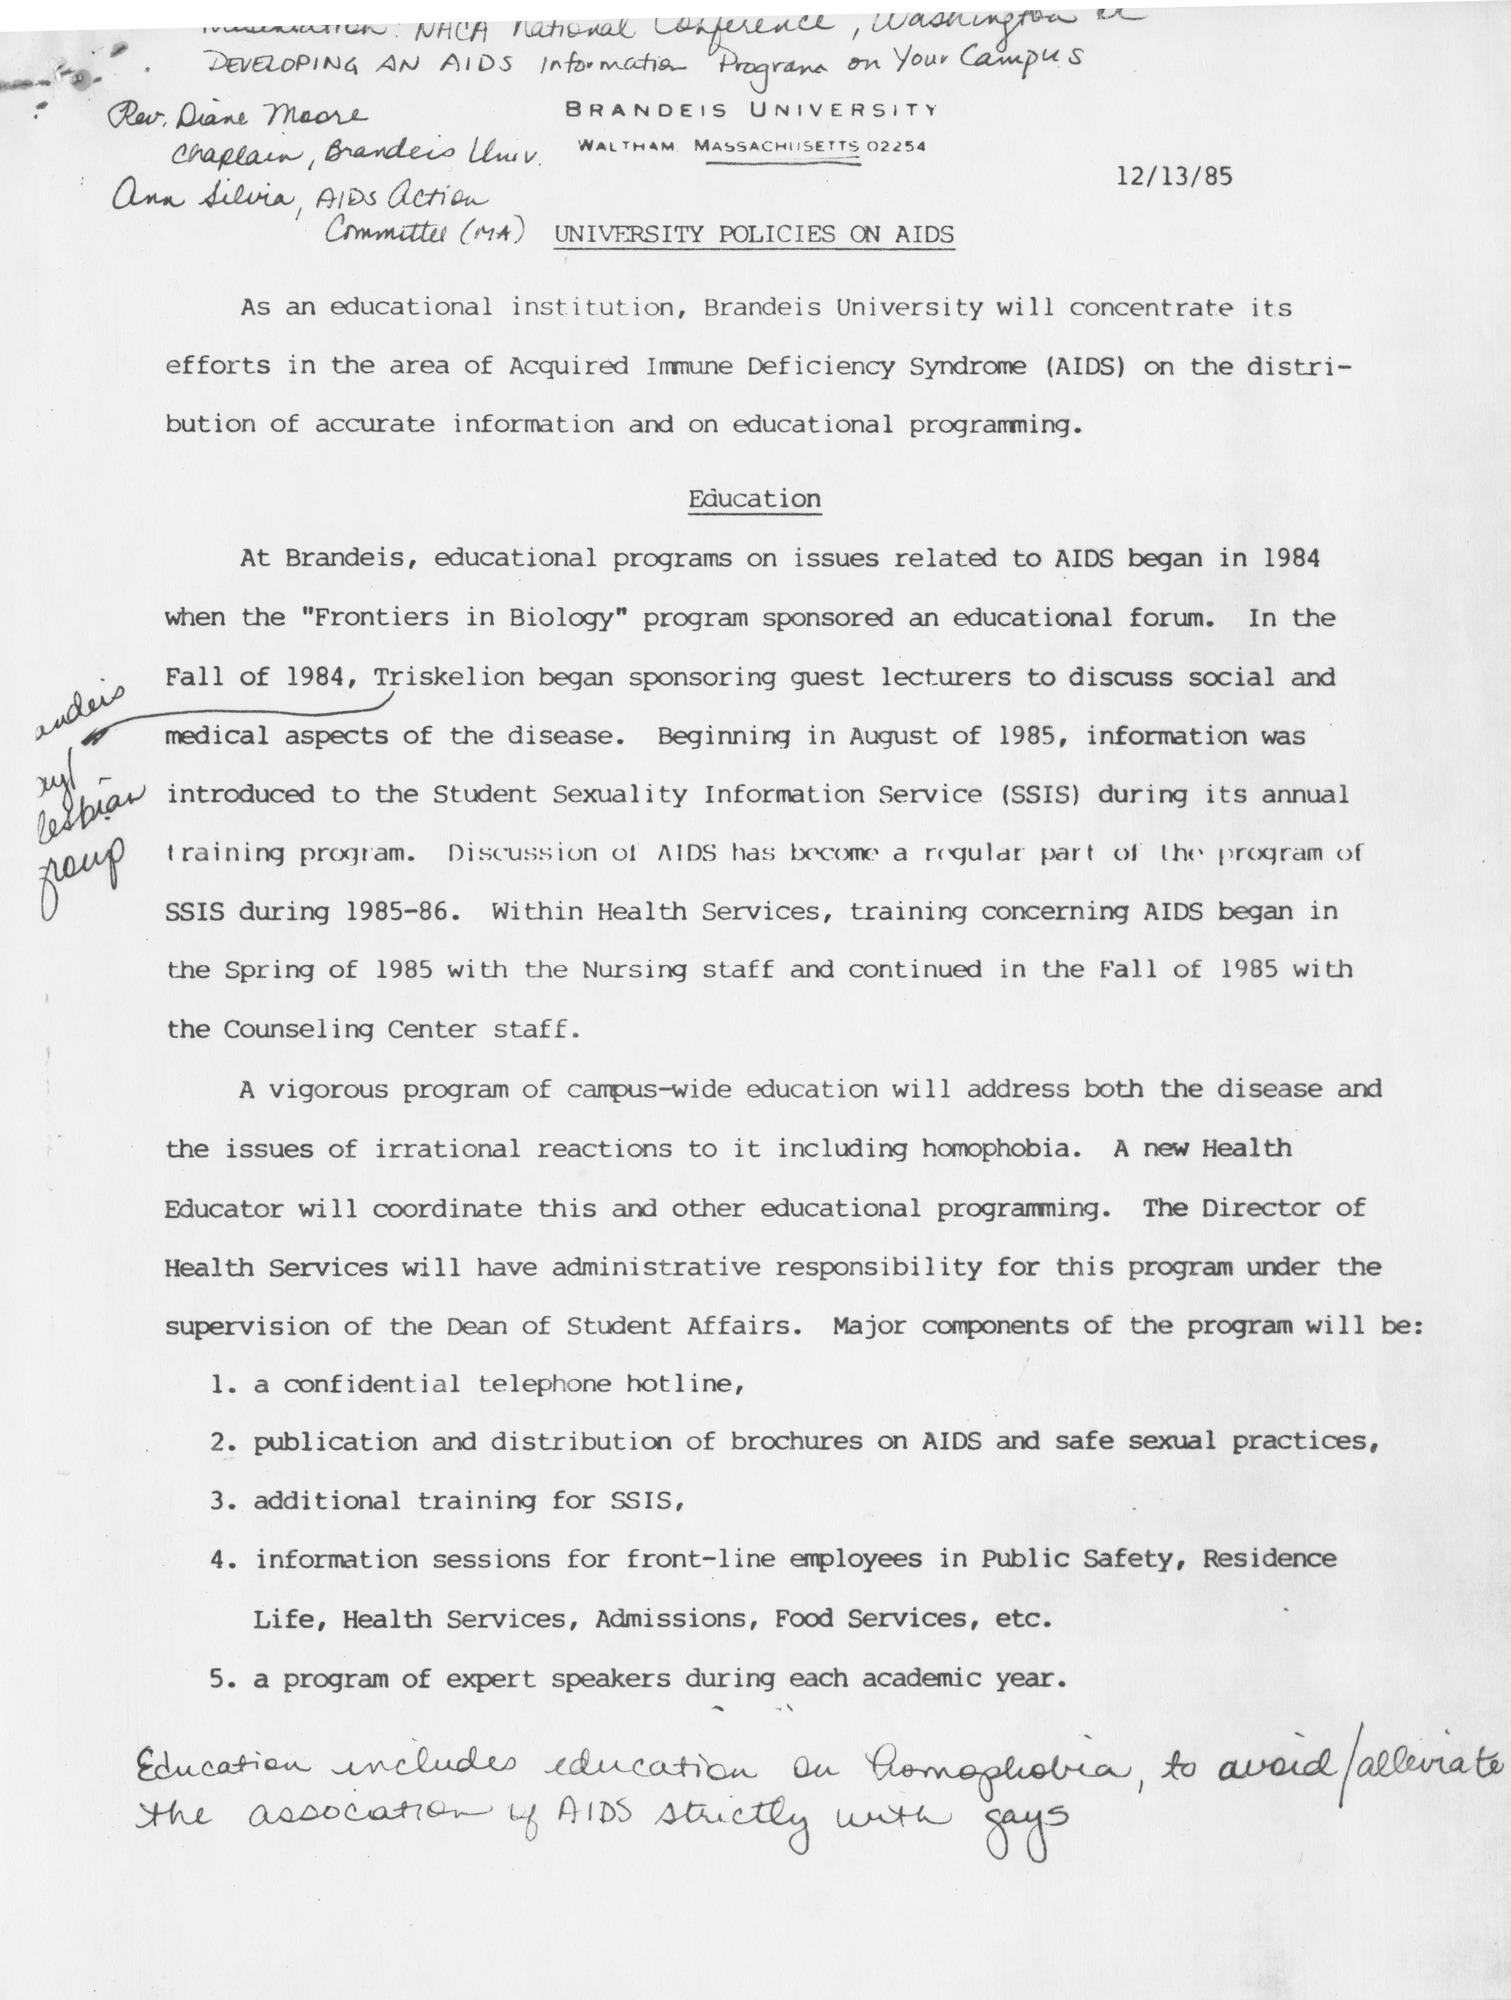 Ms2014-010_WeberMark_DocumentBrandeisUniversity_1985_1213a.jpg